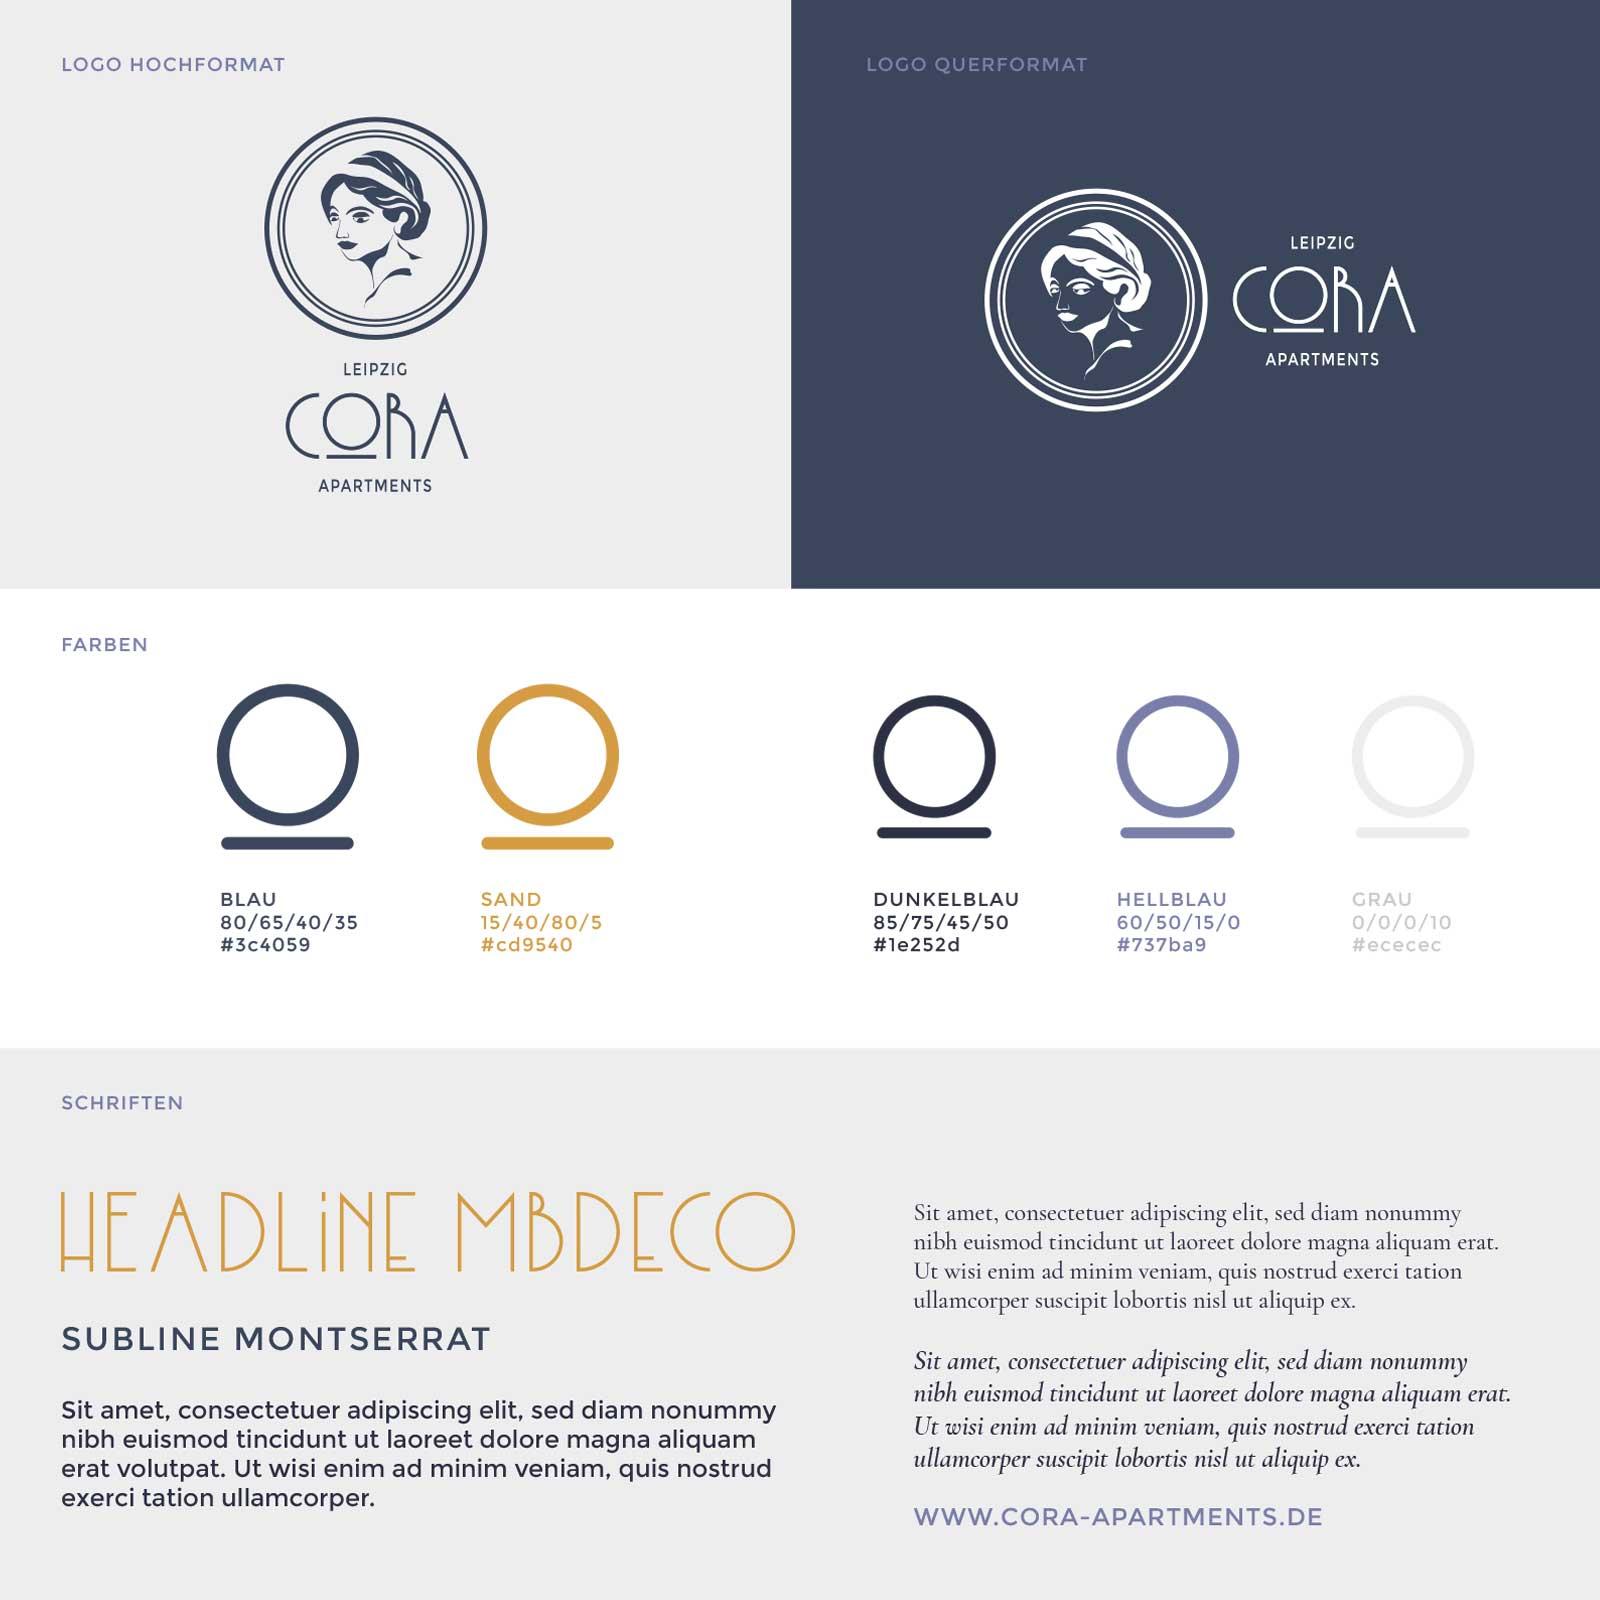 kathrin, krasselt, mediendesign, grafik, grafiker, leipzig, werbung, webdesign, logo, corporate, design, apartment, grundriss